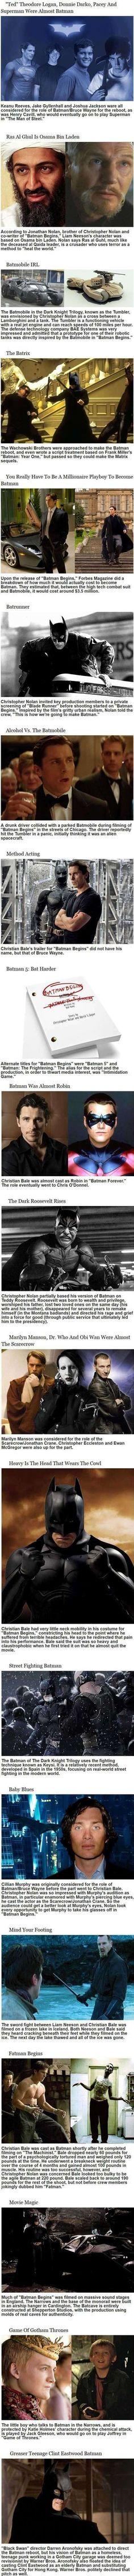 Interesting Facts About Batman